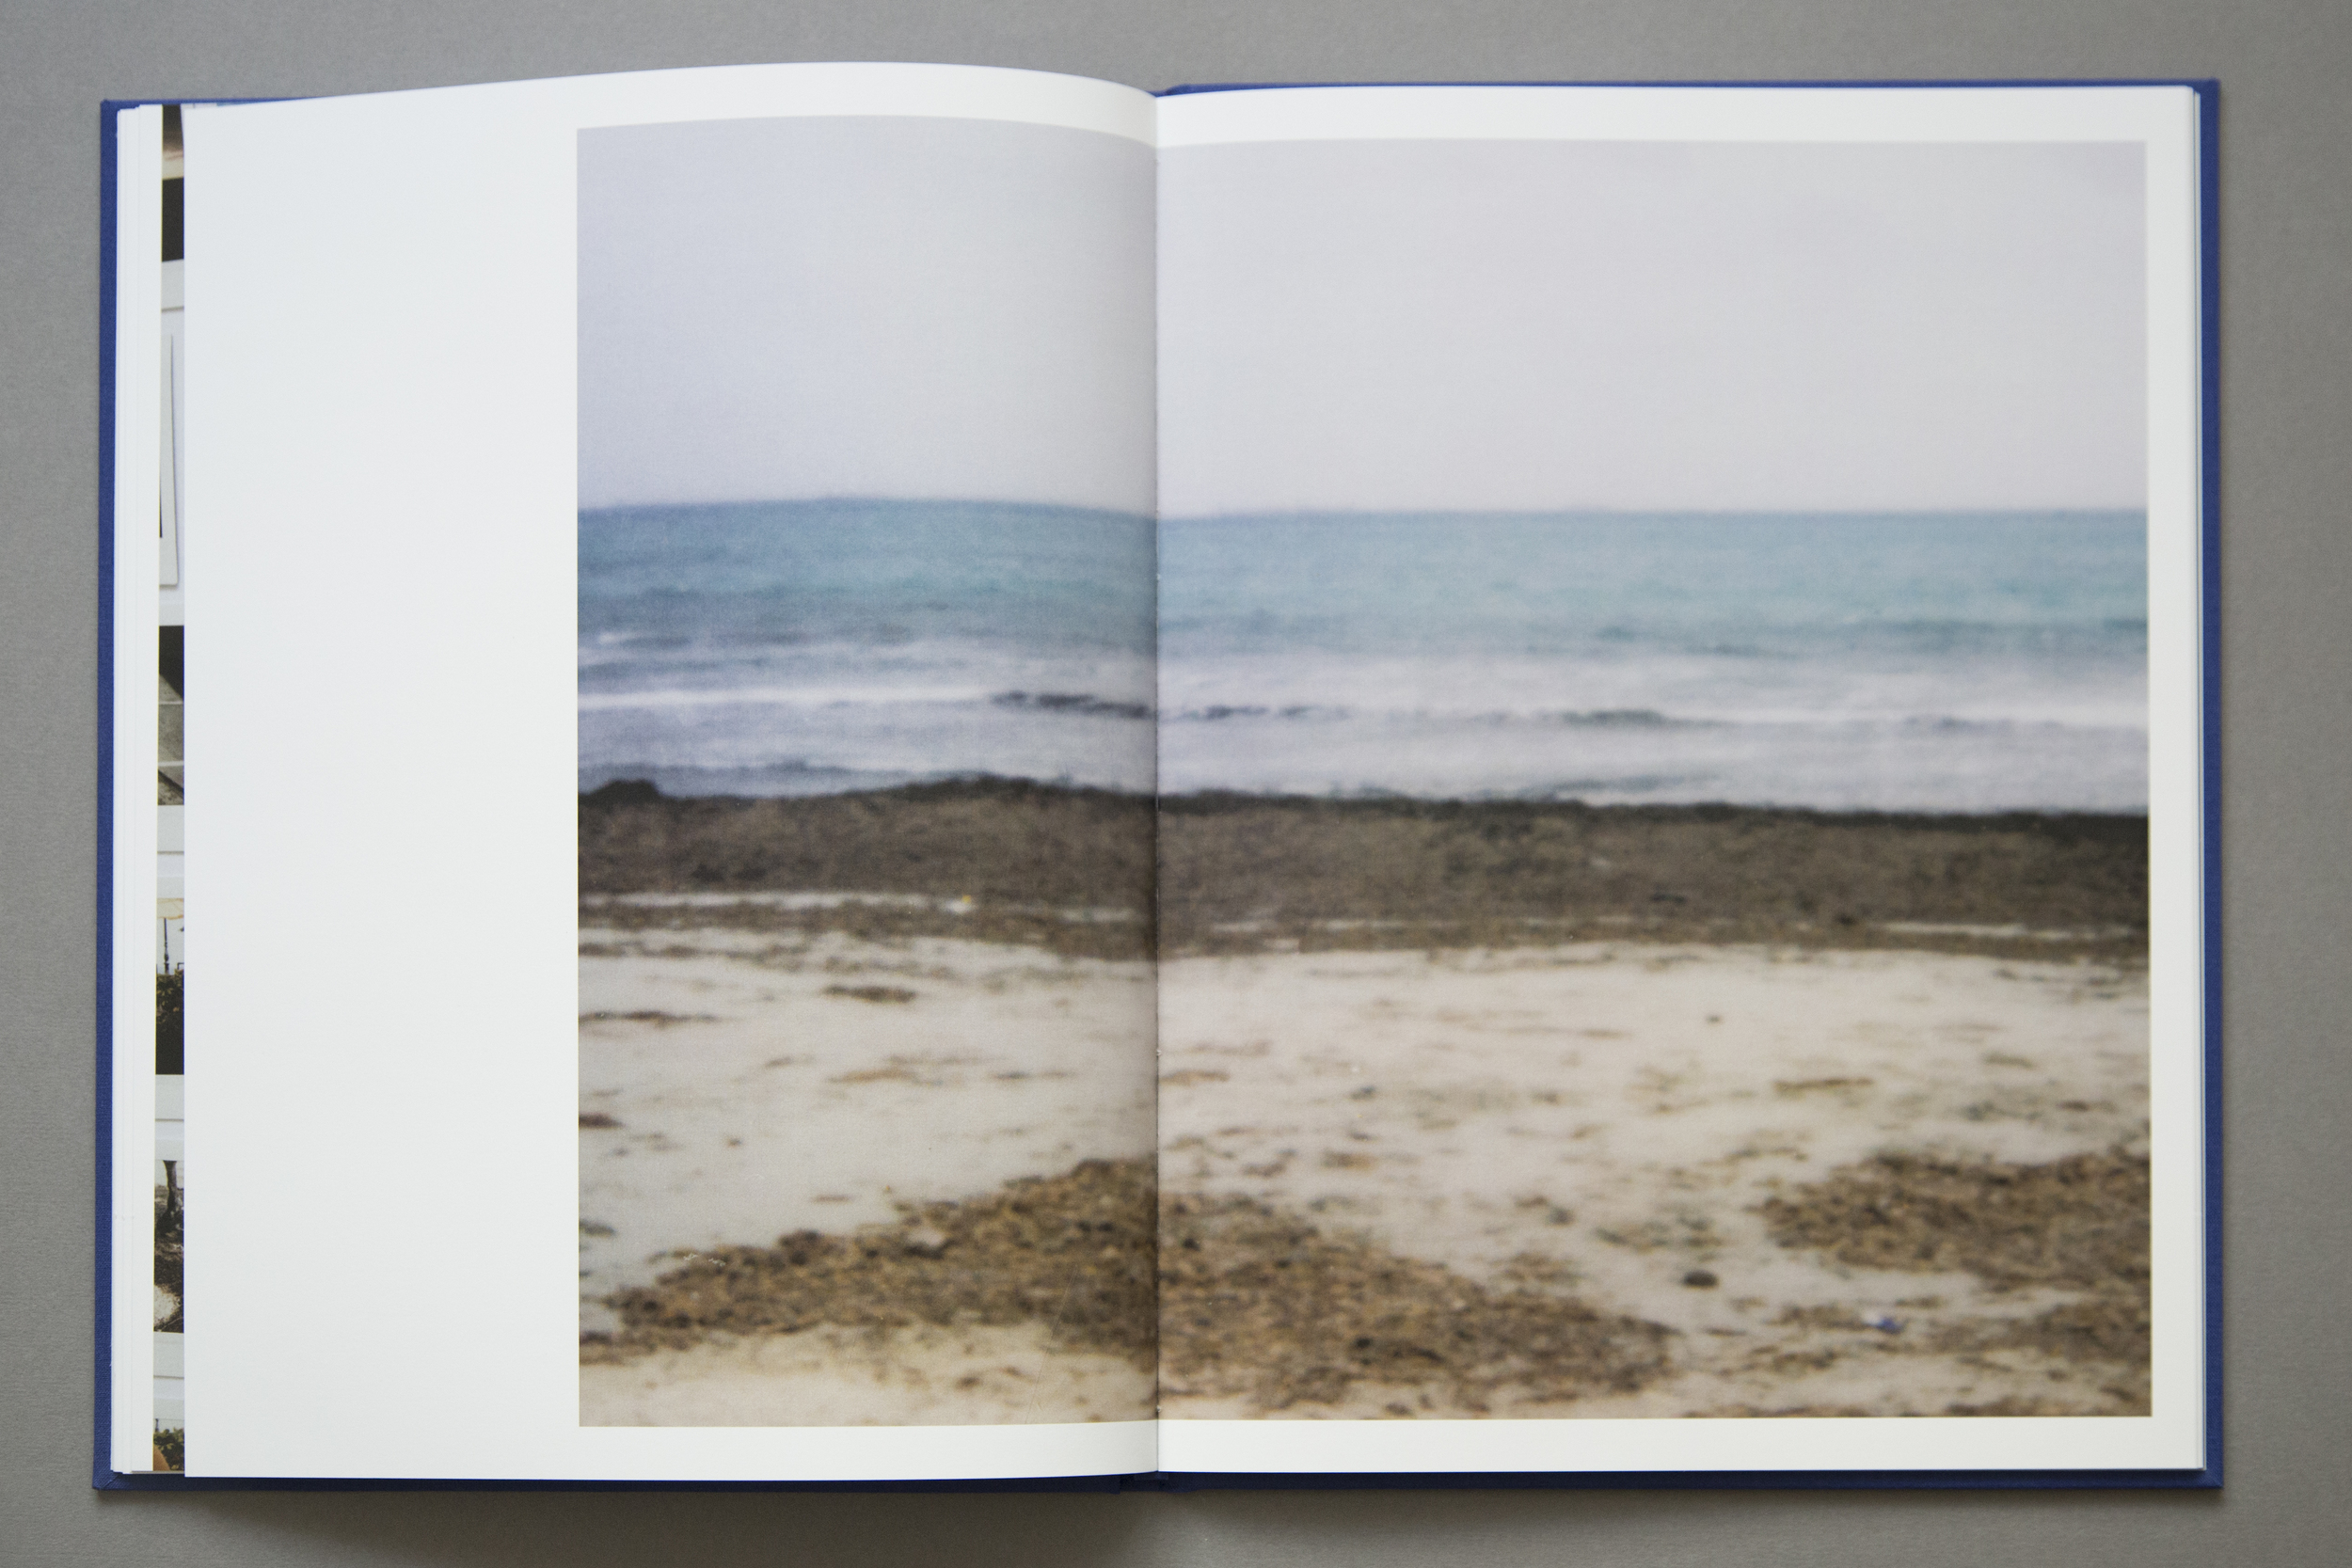 Sam_book_Photos-22.jpg